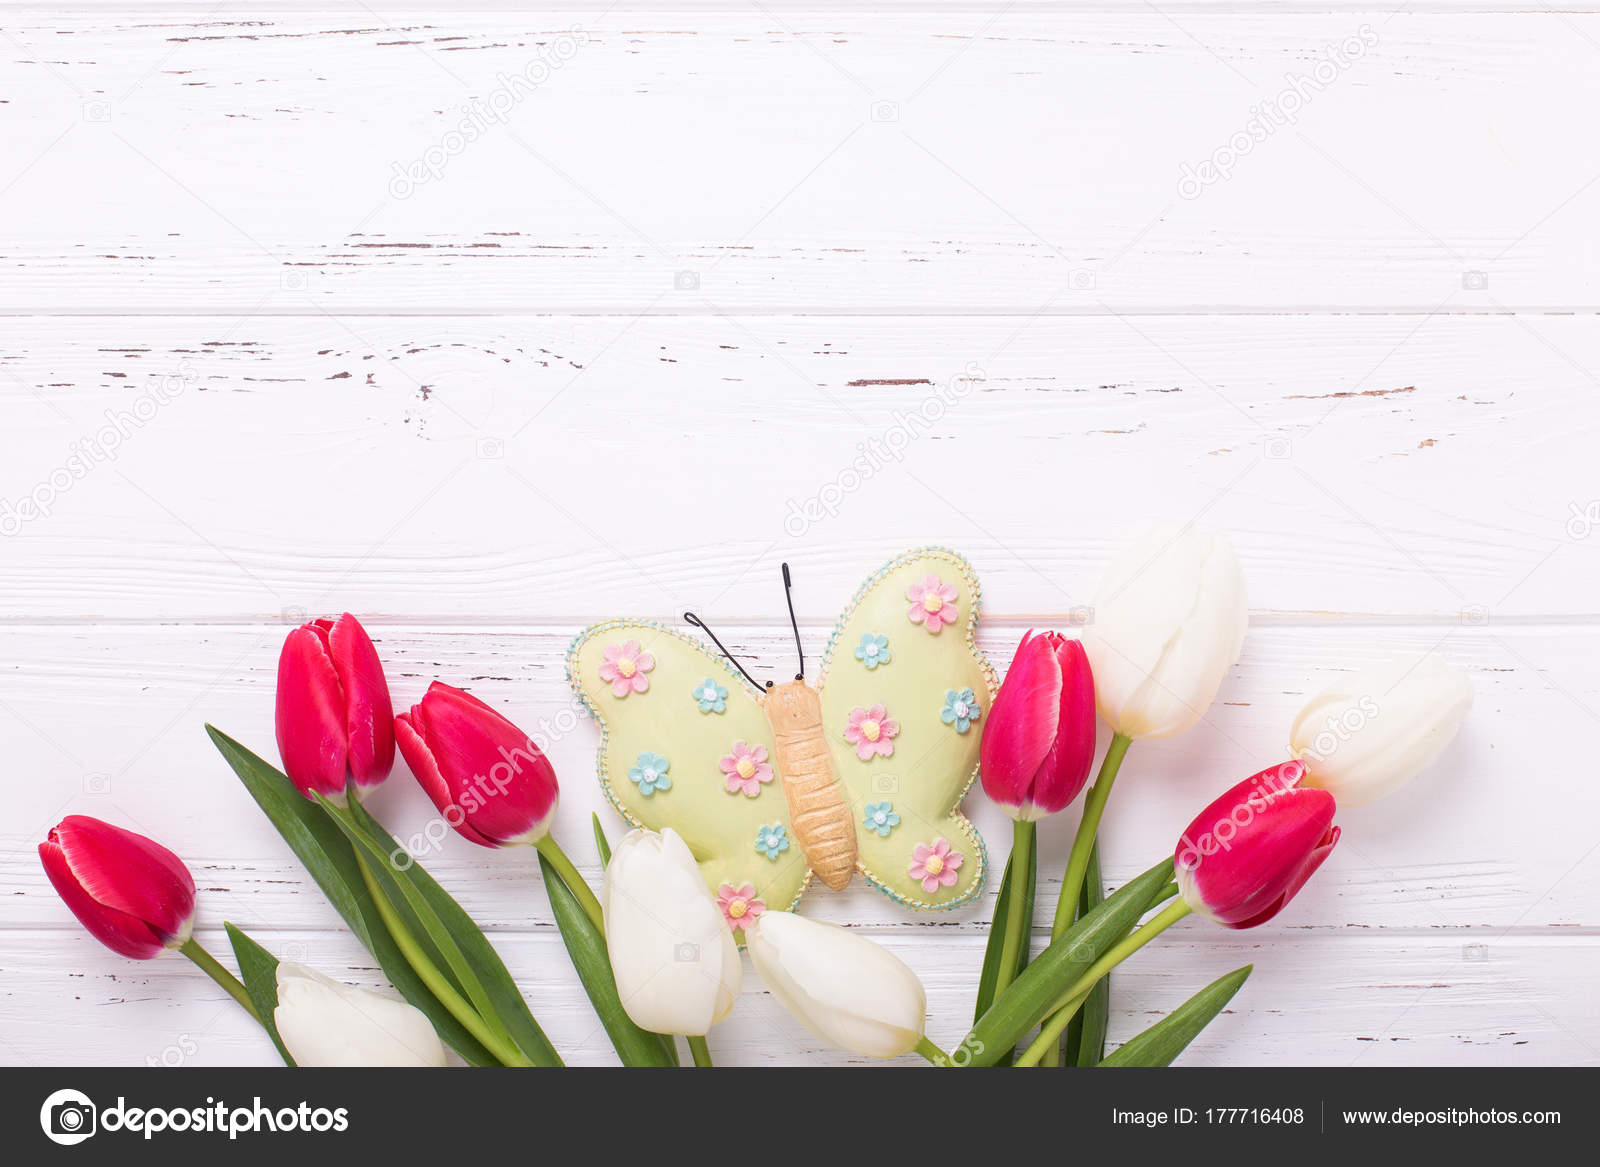 Fondos De Pantalla Rosa Rosa Flores Fondo De Madera: Flores De Tulipán En Fondo De Pantalla De Madera